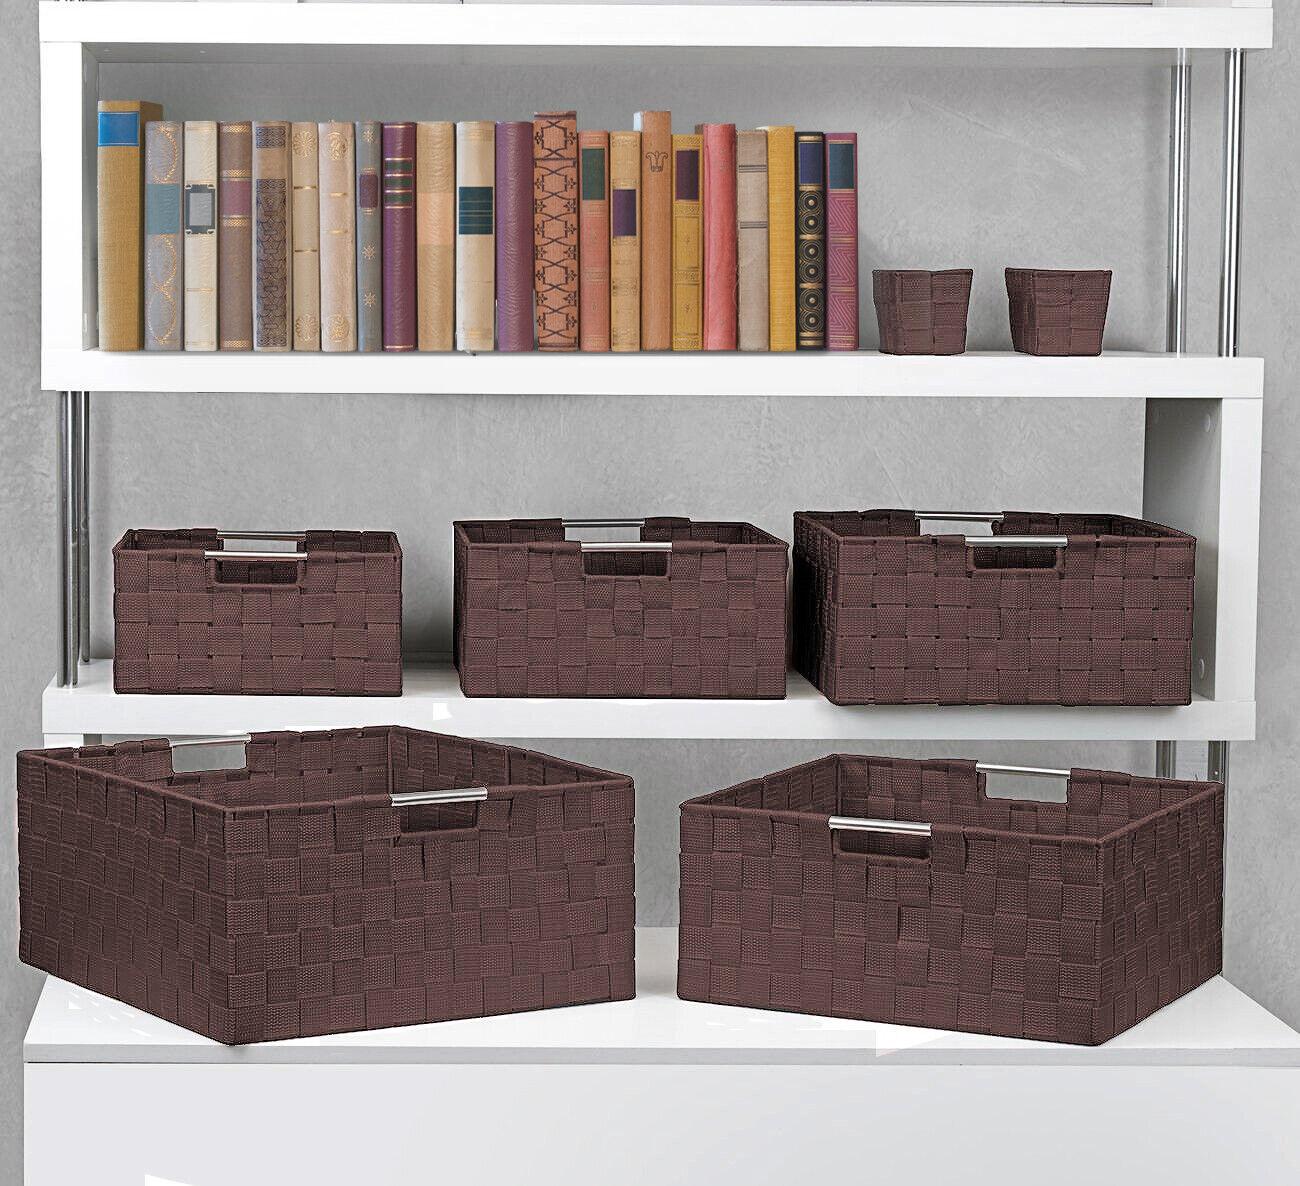 7-Pack Storage Box Set for Closet & Shelves - Woven Fabric Basket Organizer Bins